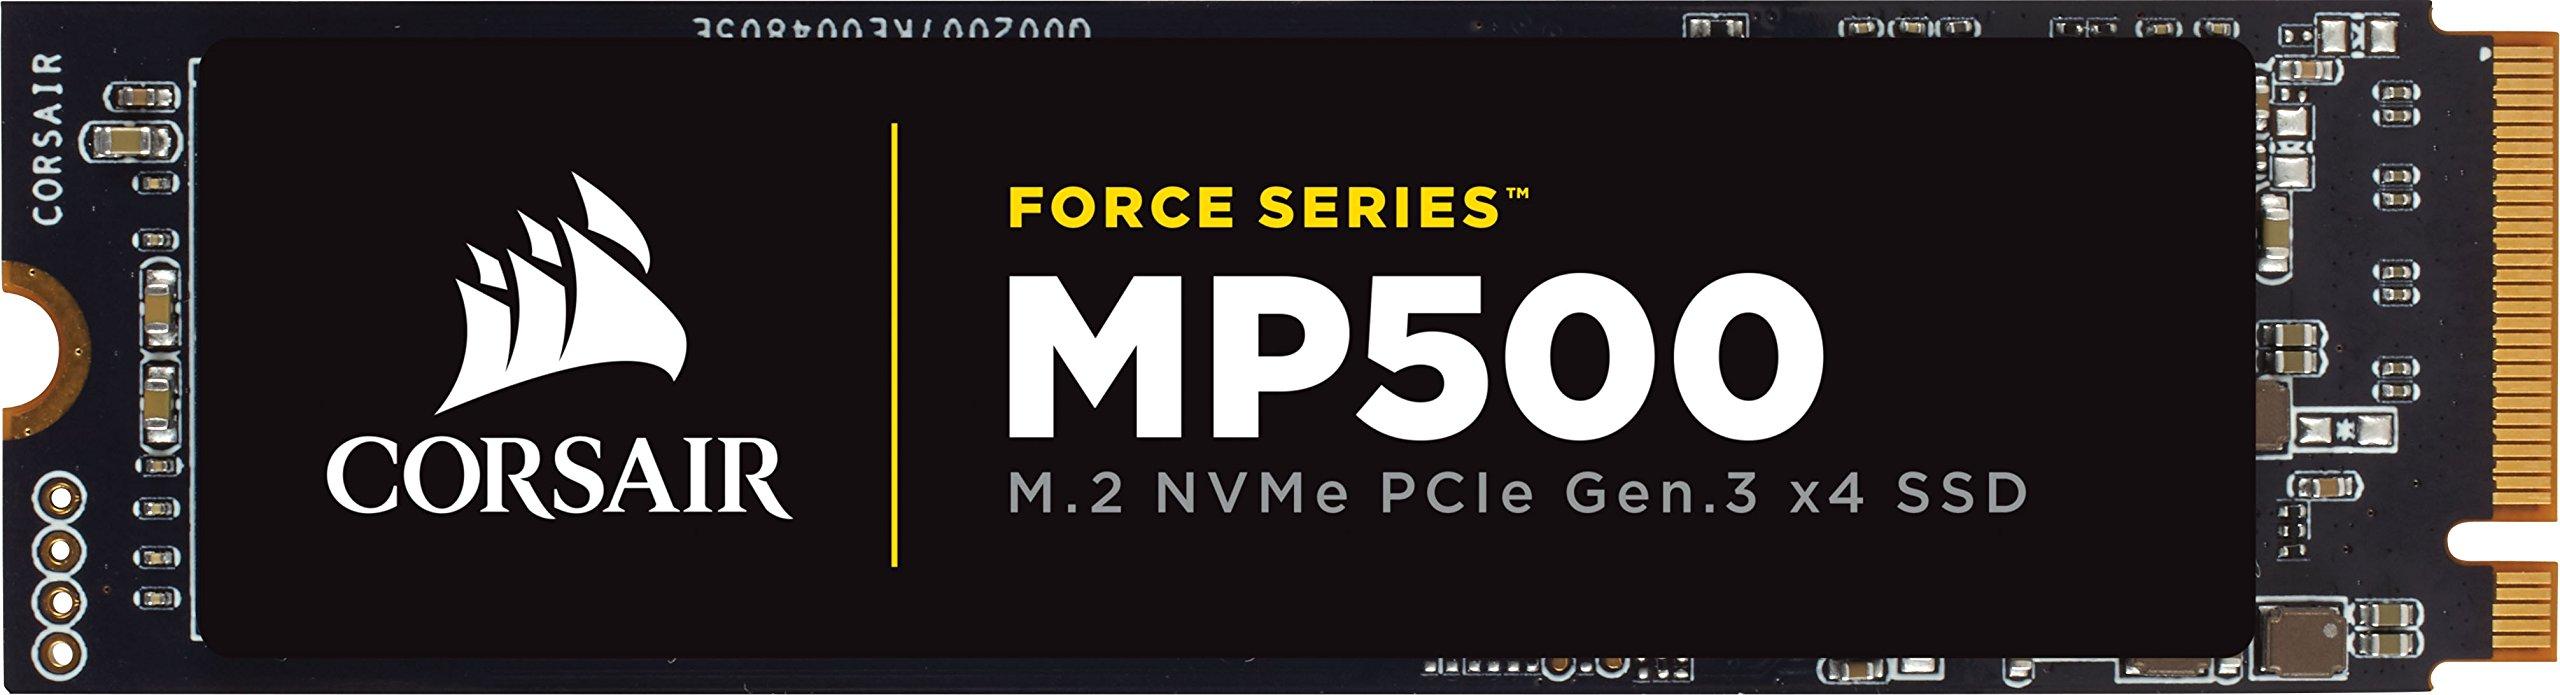 Corsair Force Series MP500 240GB M.2 NVMe PCIe Gen. 3 x4 SSD by Corsair (Image #2)